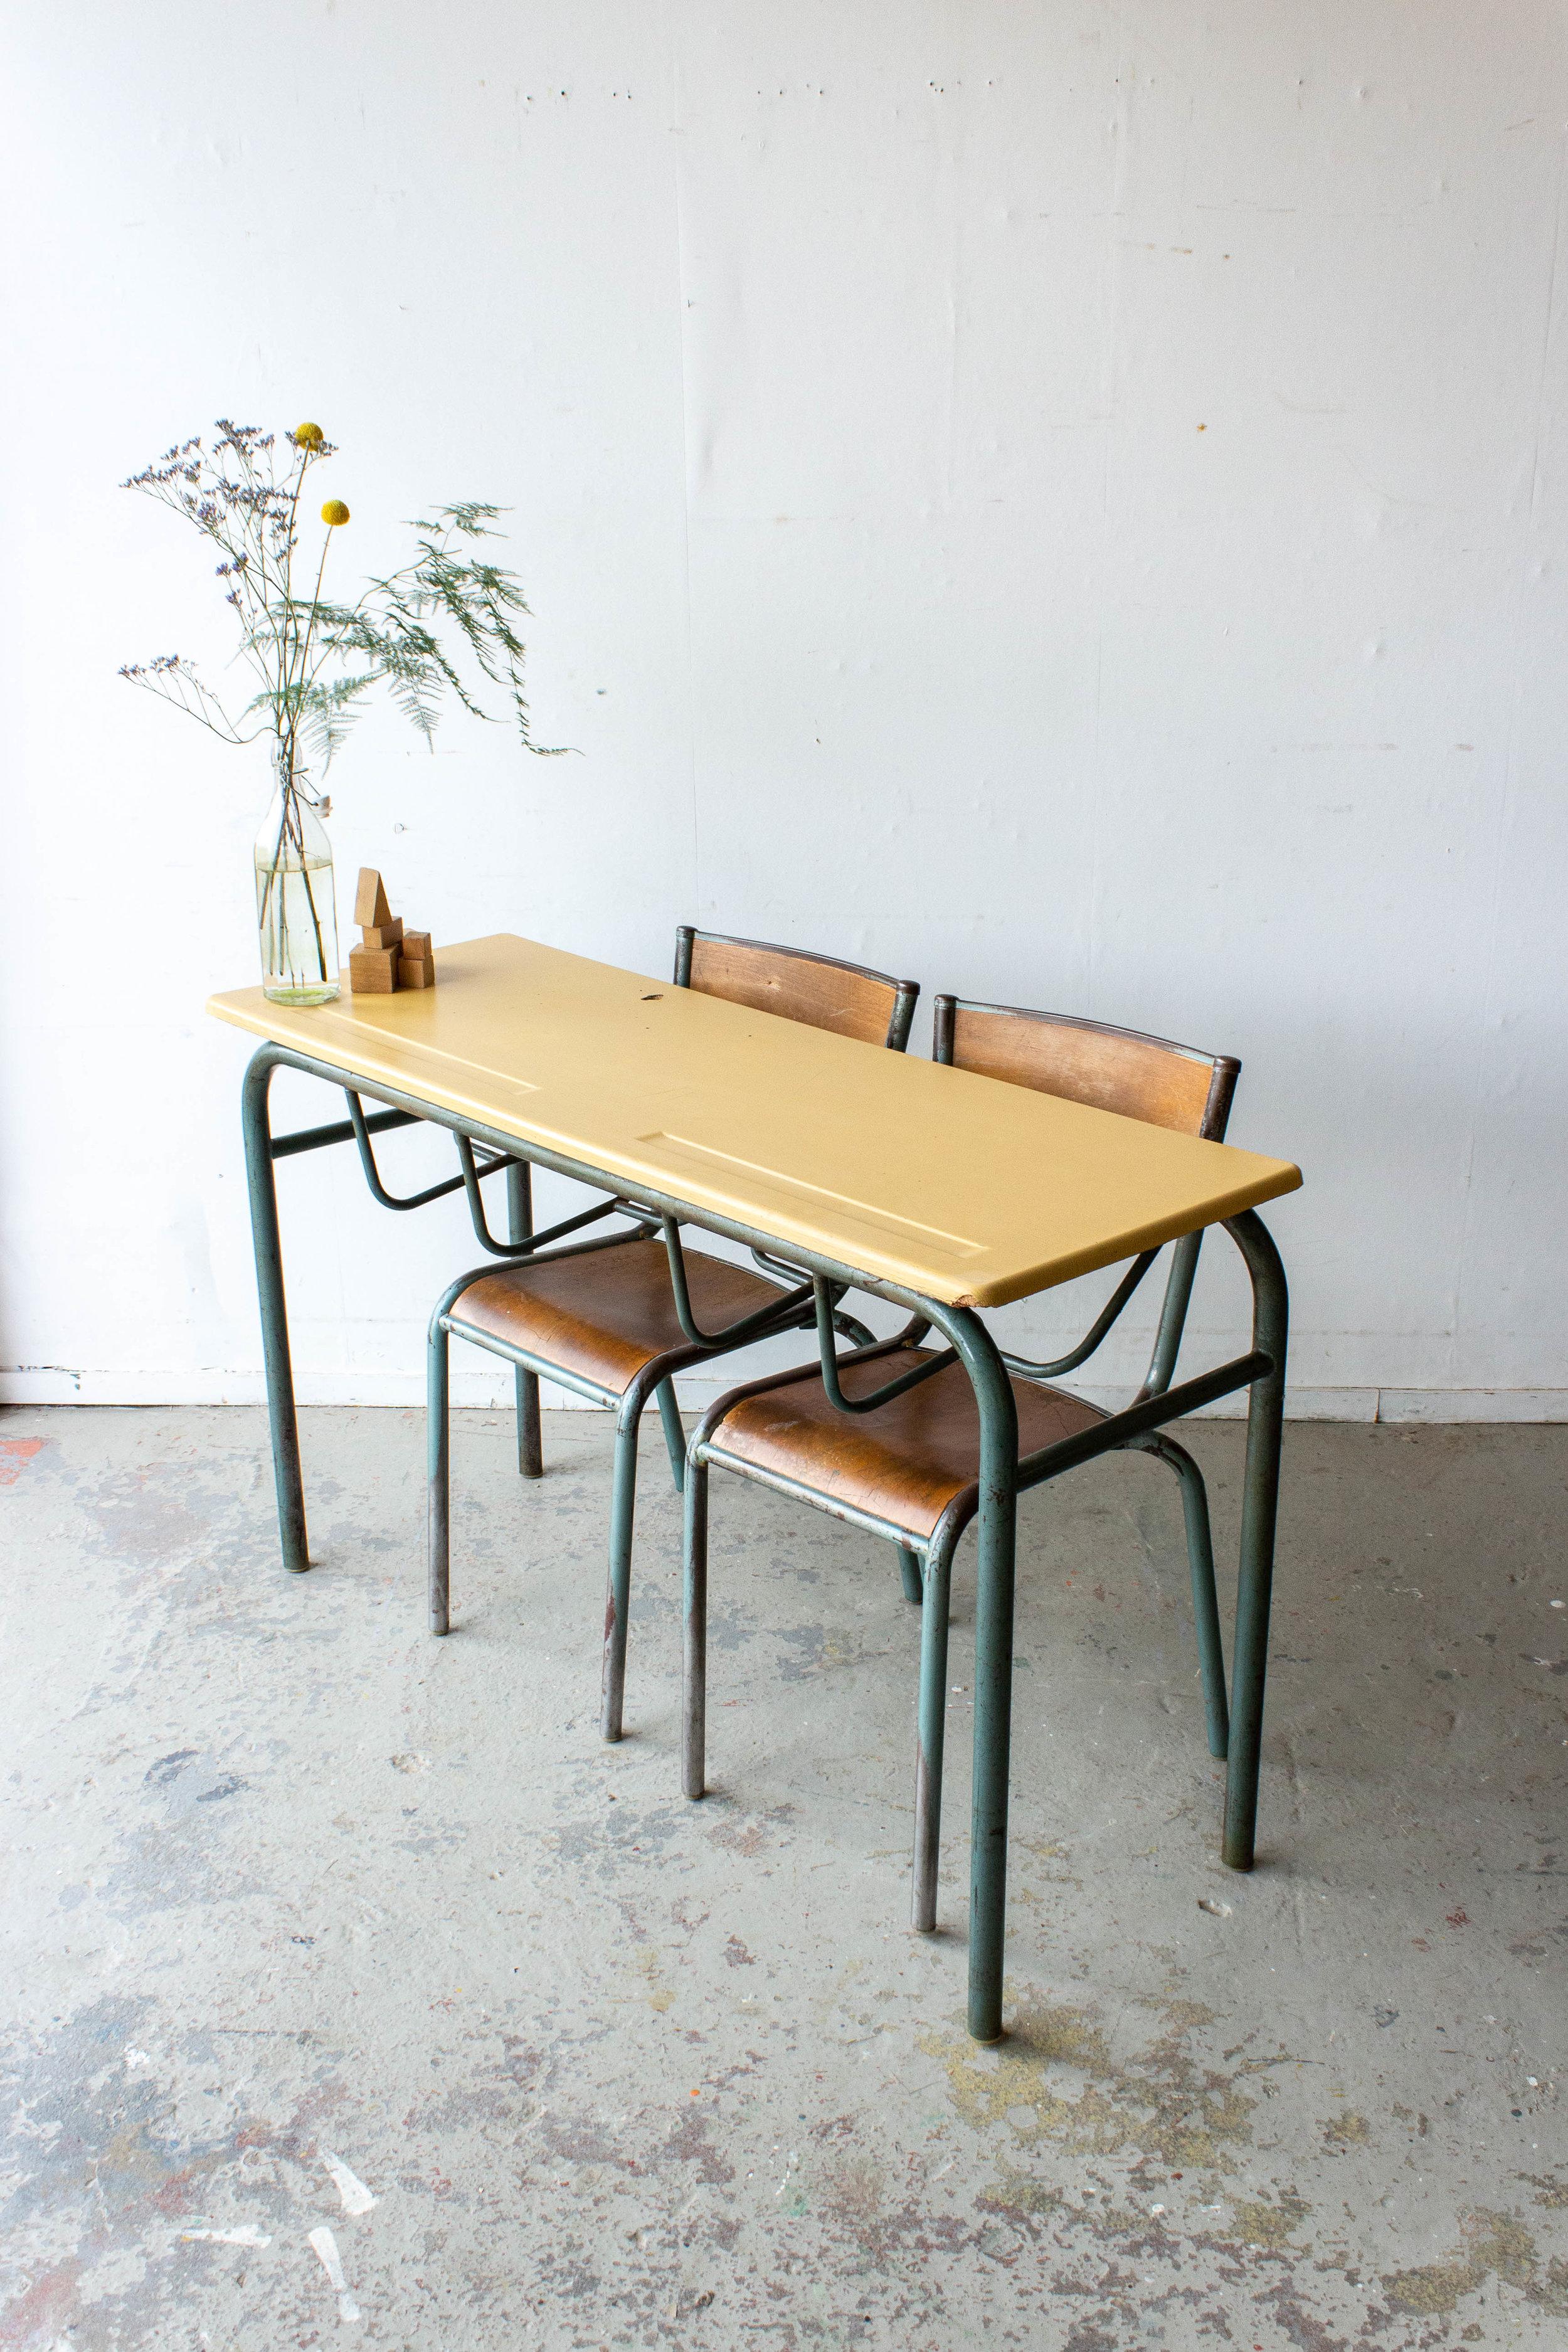 3151 - 2p vintage schooltafel met geel blad-6.jpg